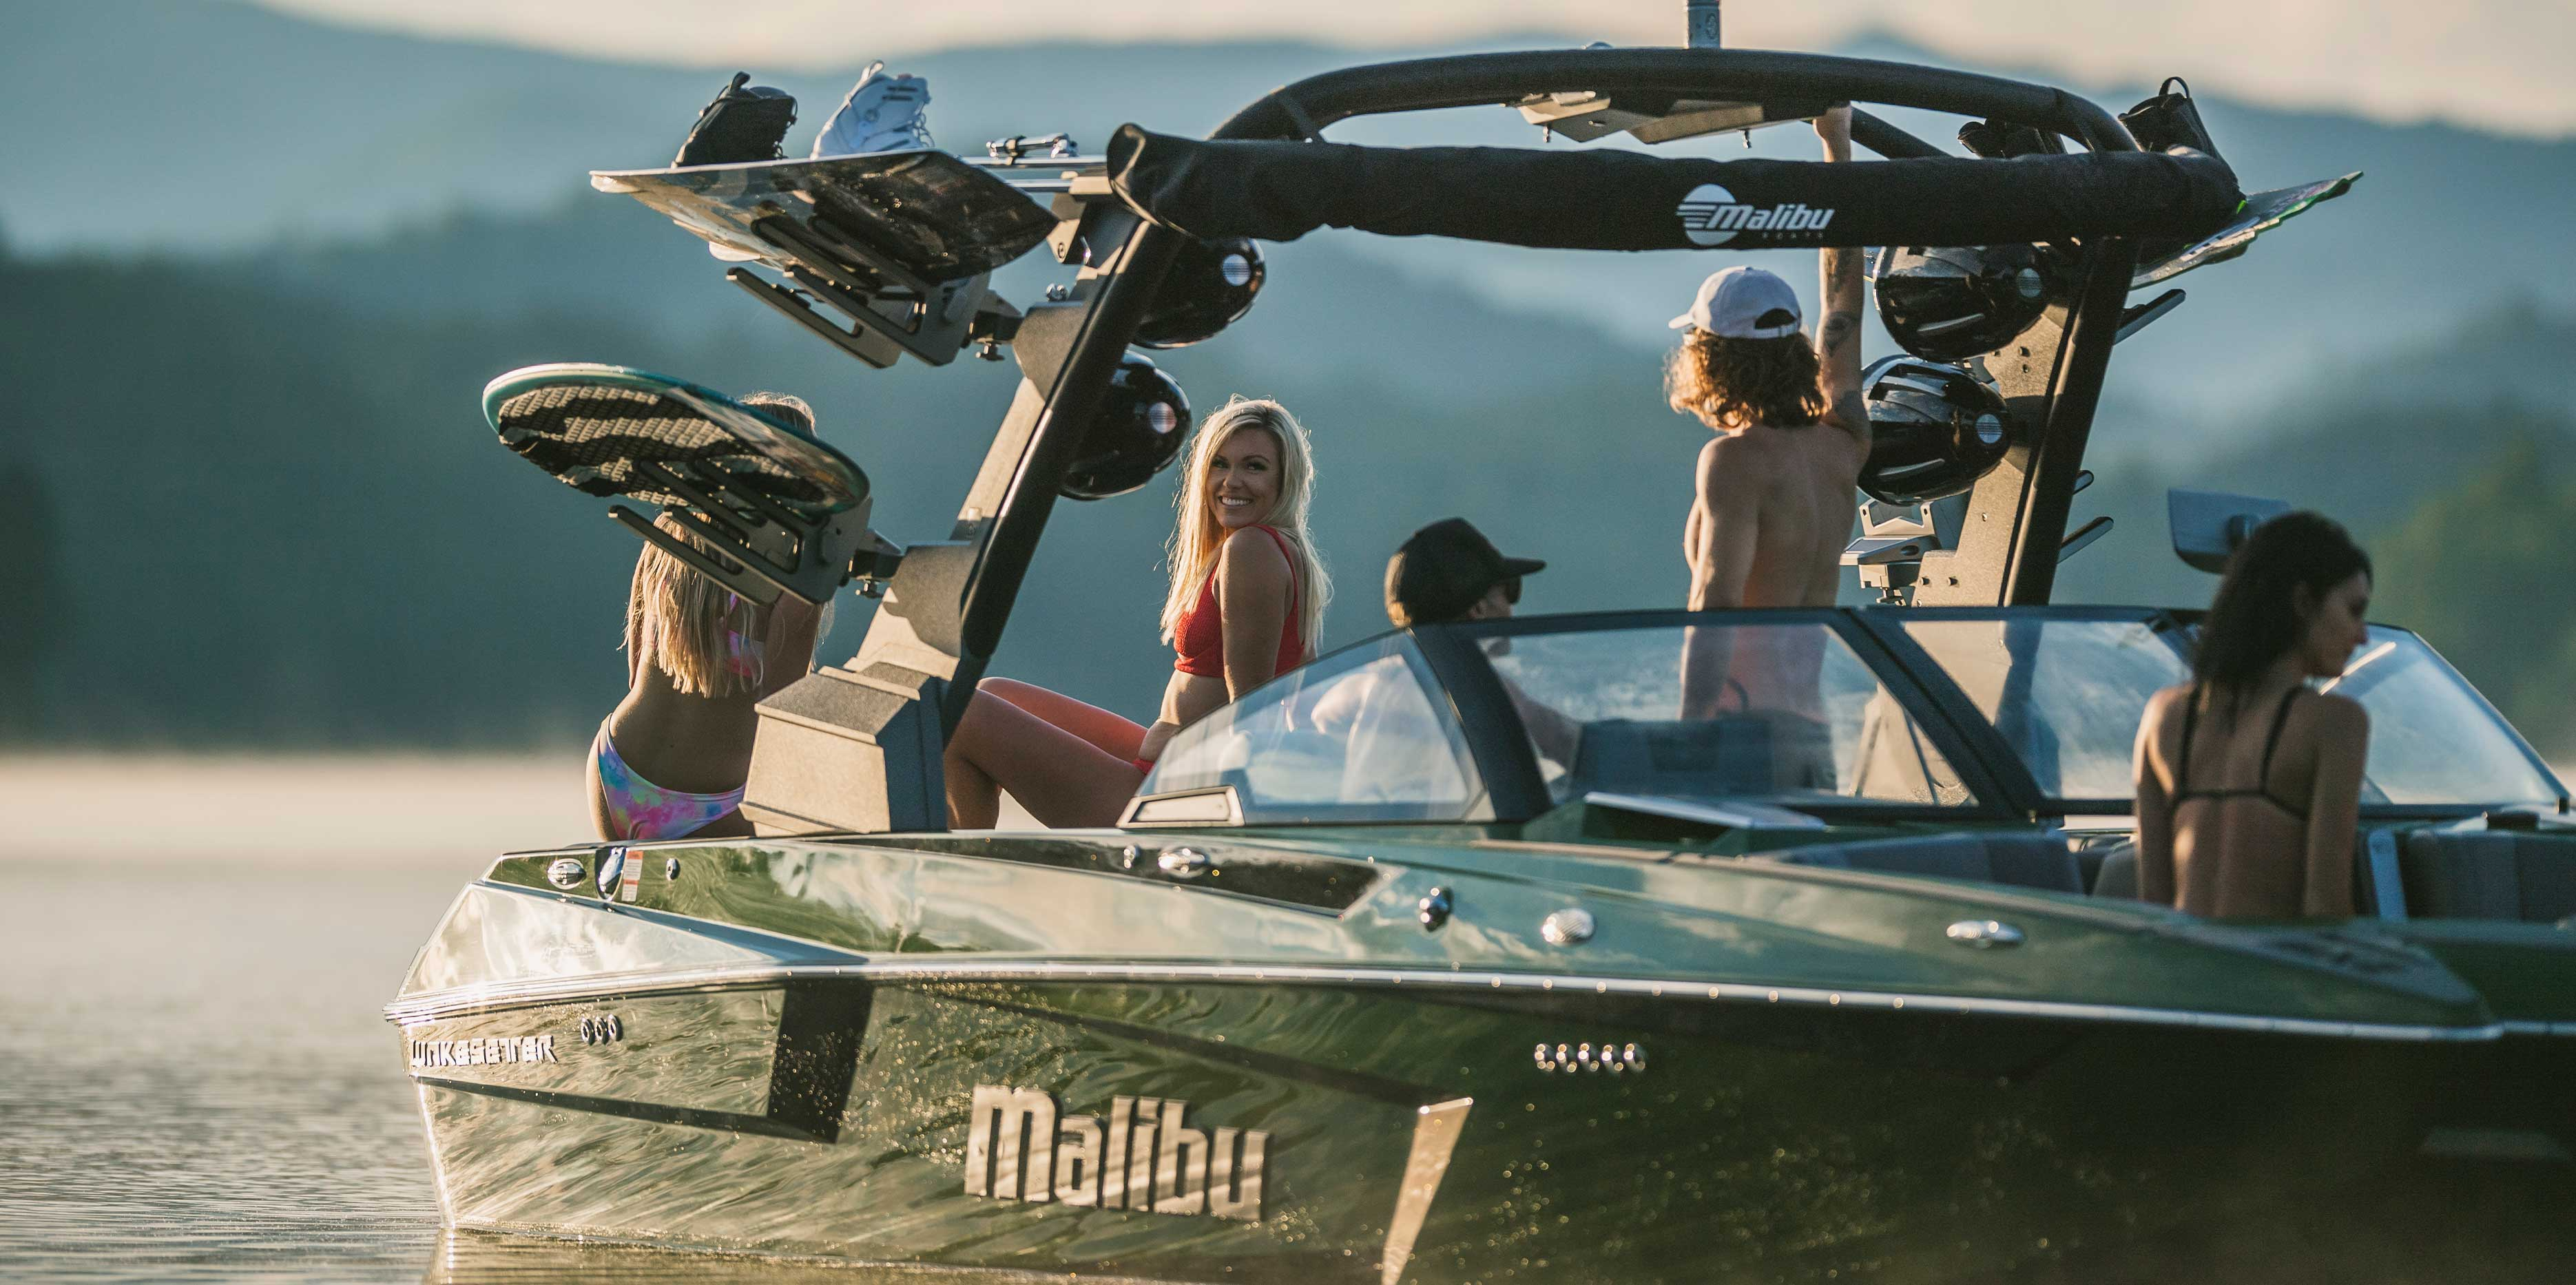 Malibu boats 23 MXZ side profile image